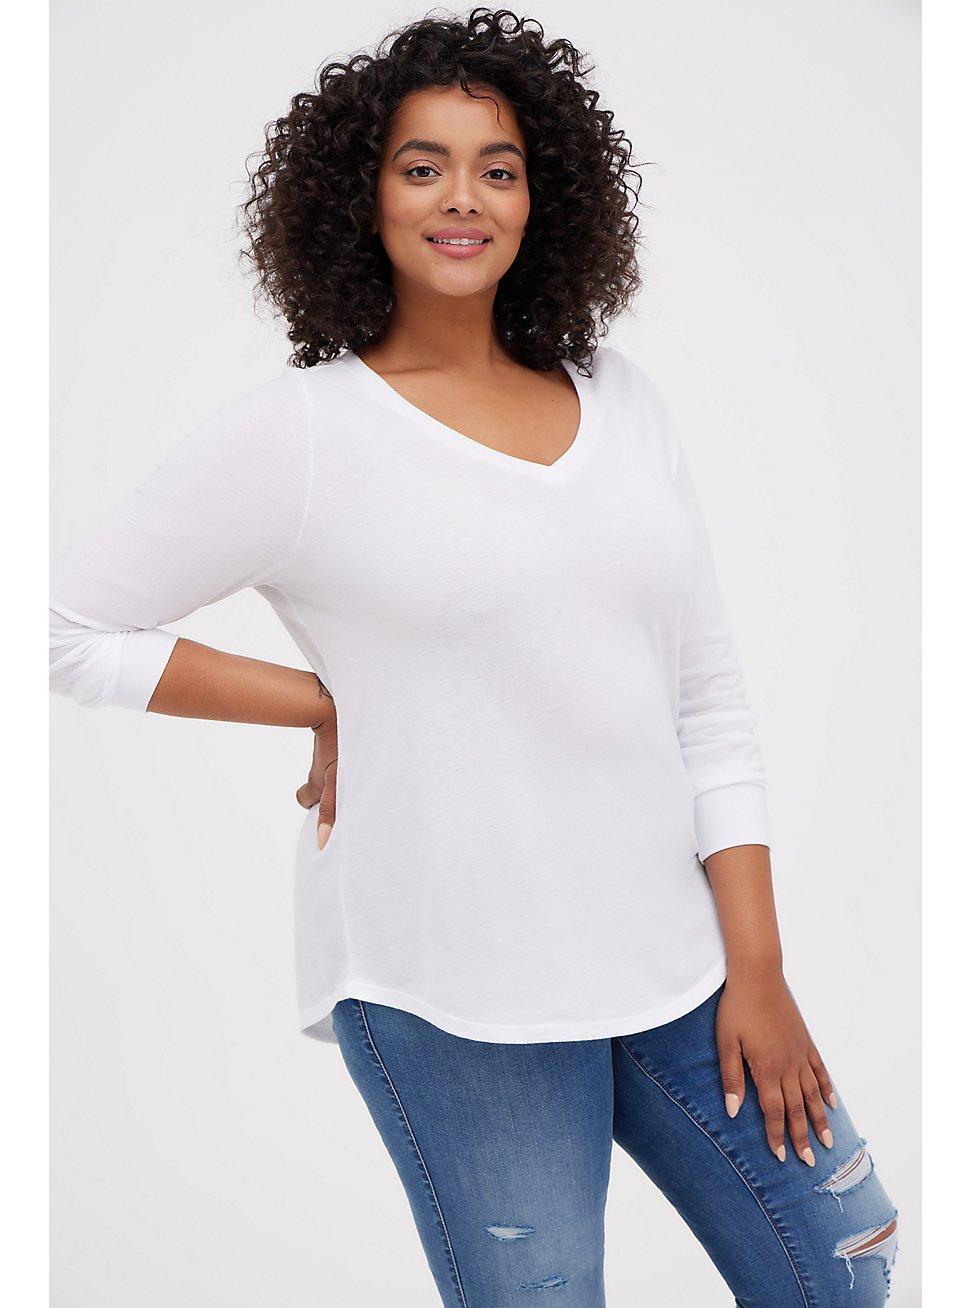 Plus Size Girlfriend Tee – Signature Jersey White, BRIGHT WHITE, hi-res